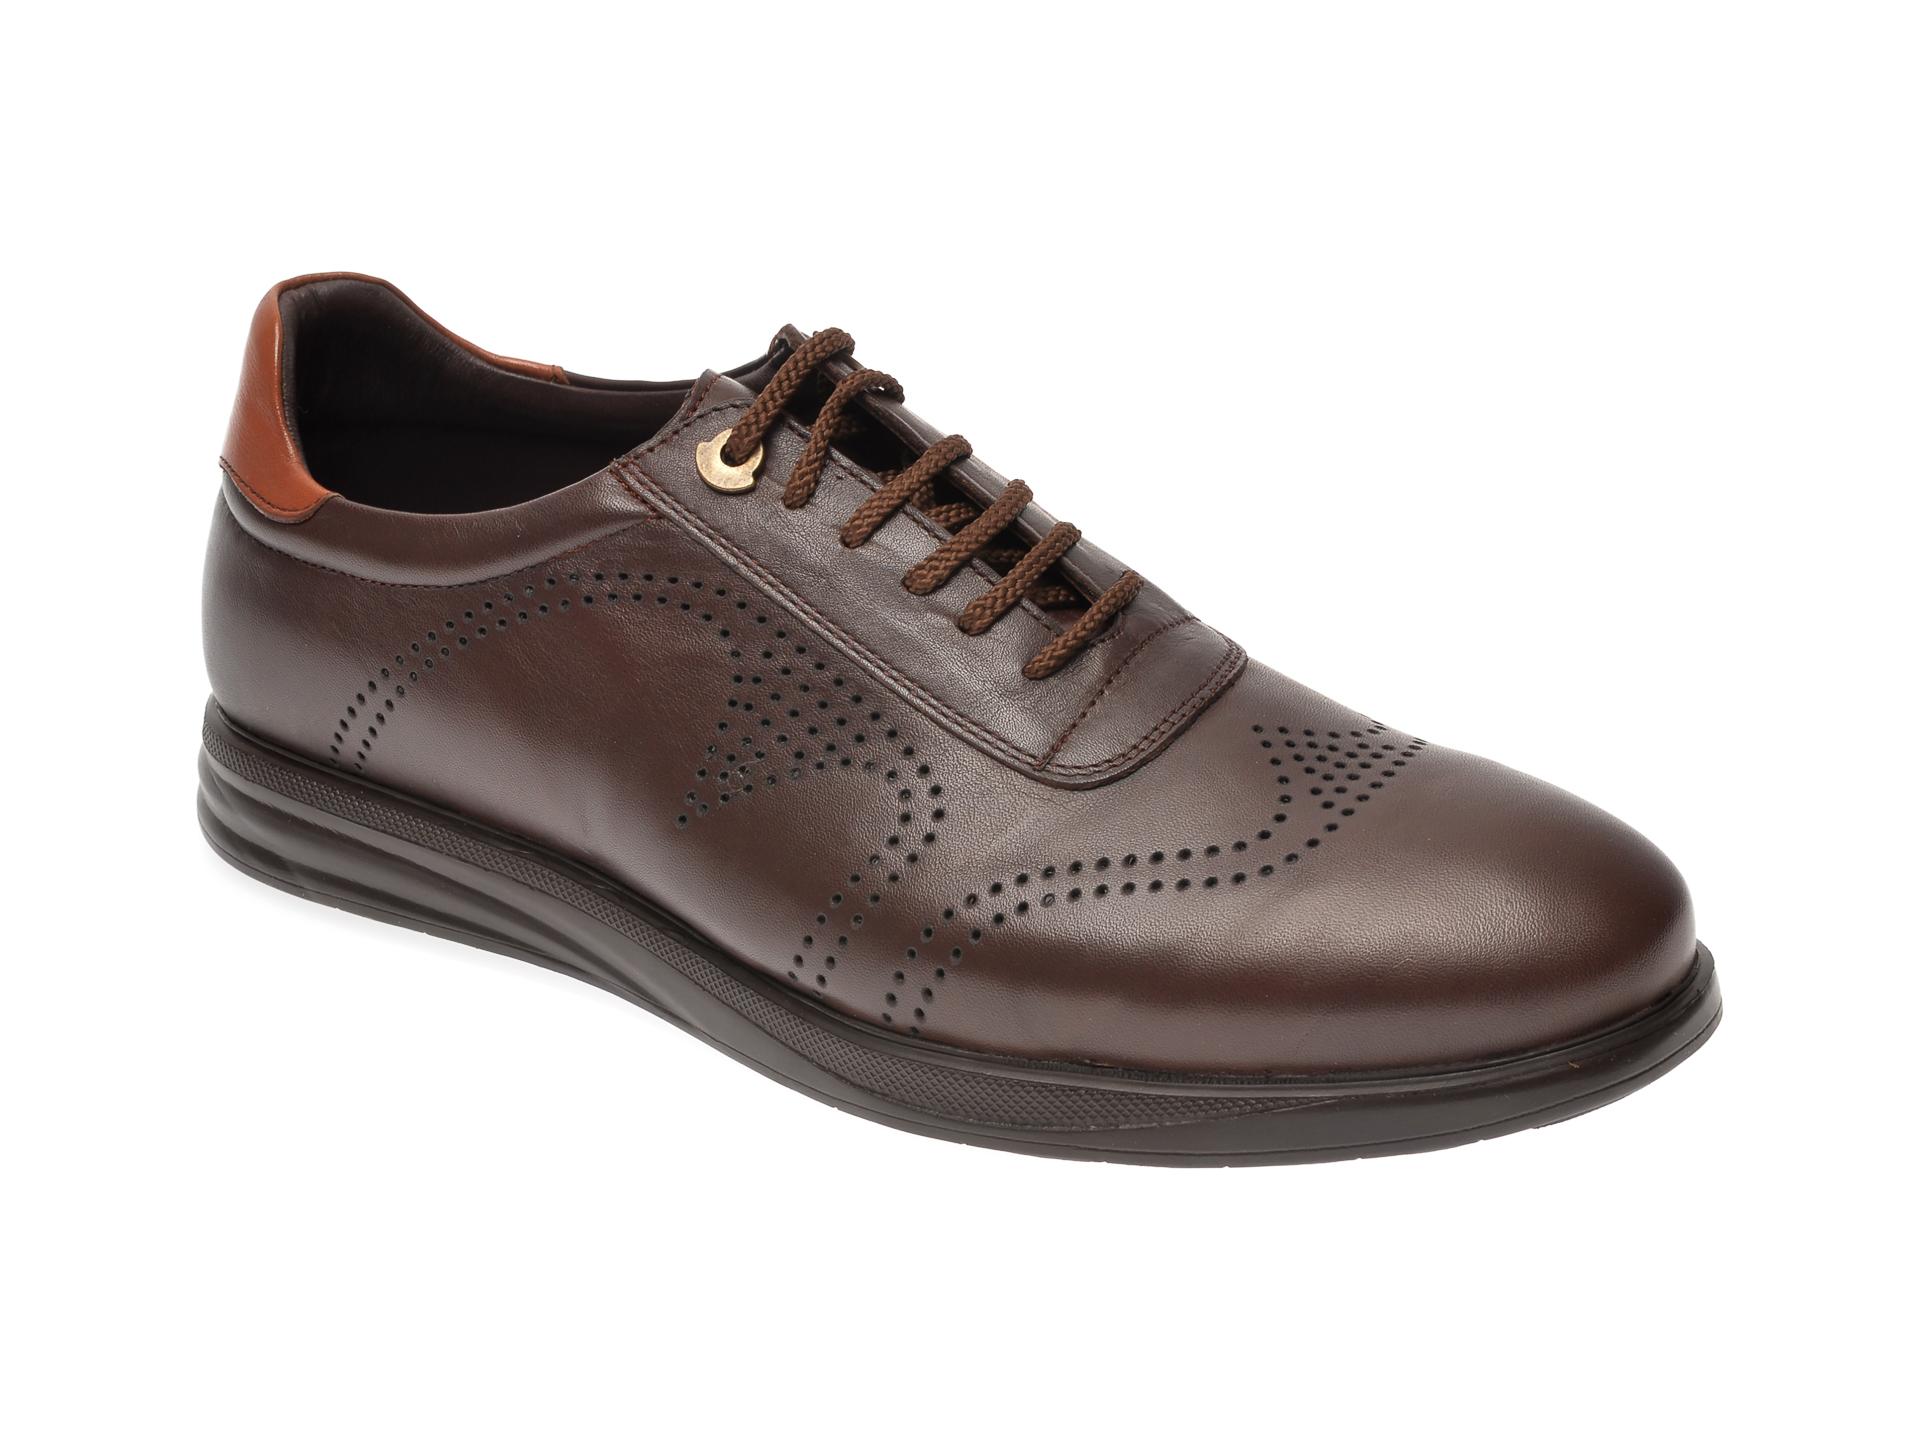 Pantofi OTTER maro, E881, din piele naturala